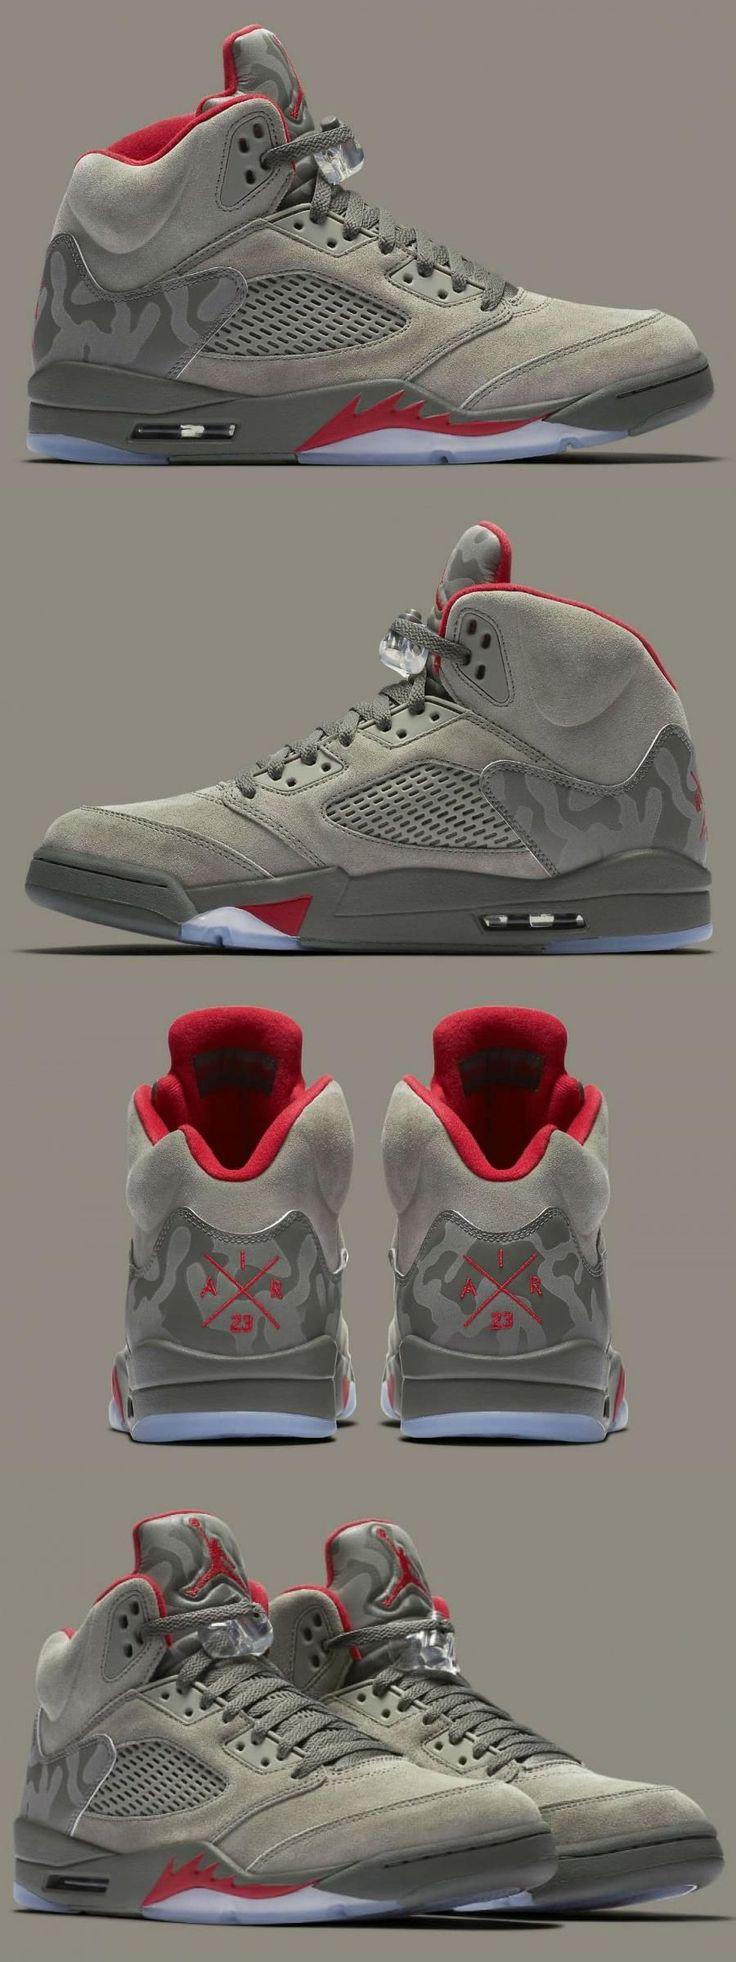 "Air Jordan 5 ""camo"" 3m Reflective For in 2020 Fashion"